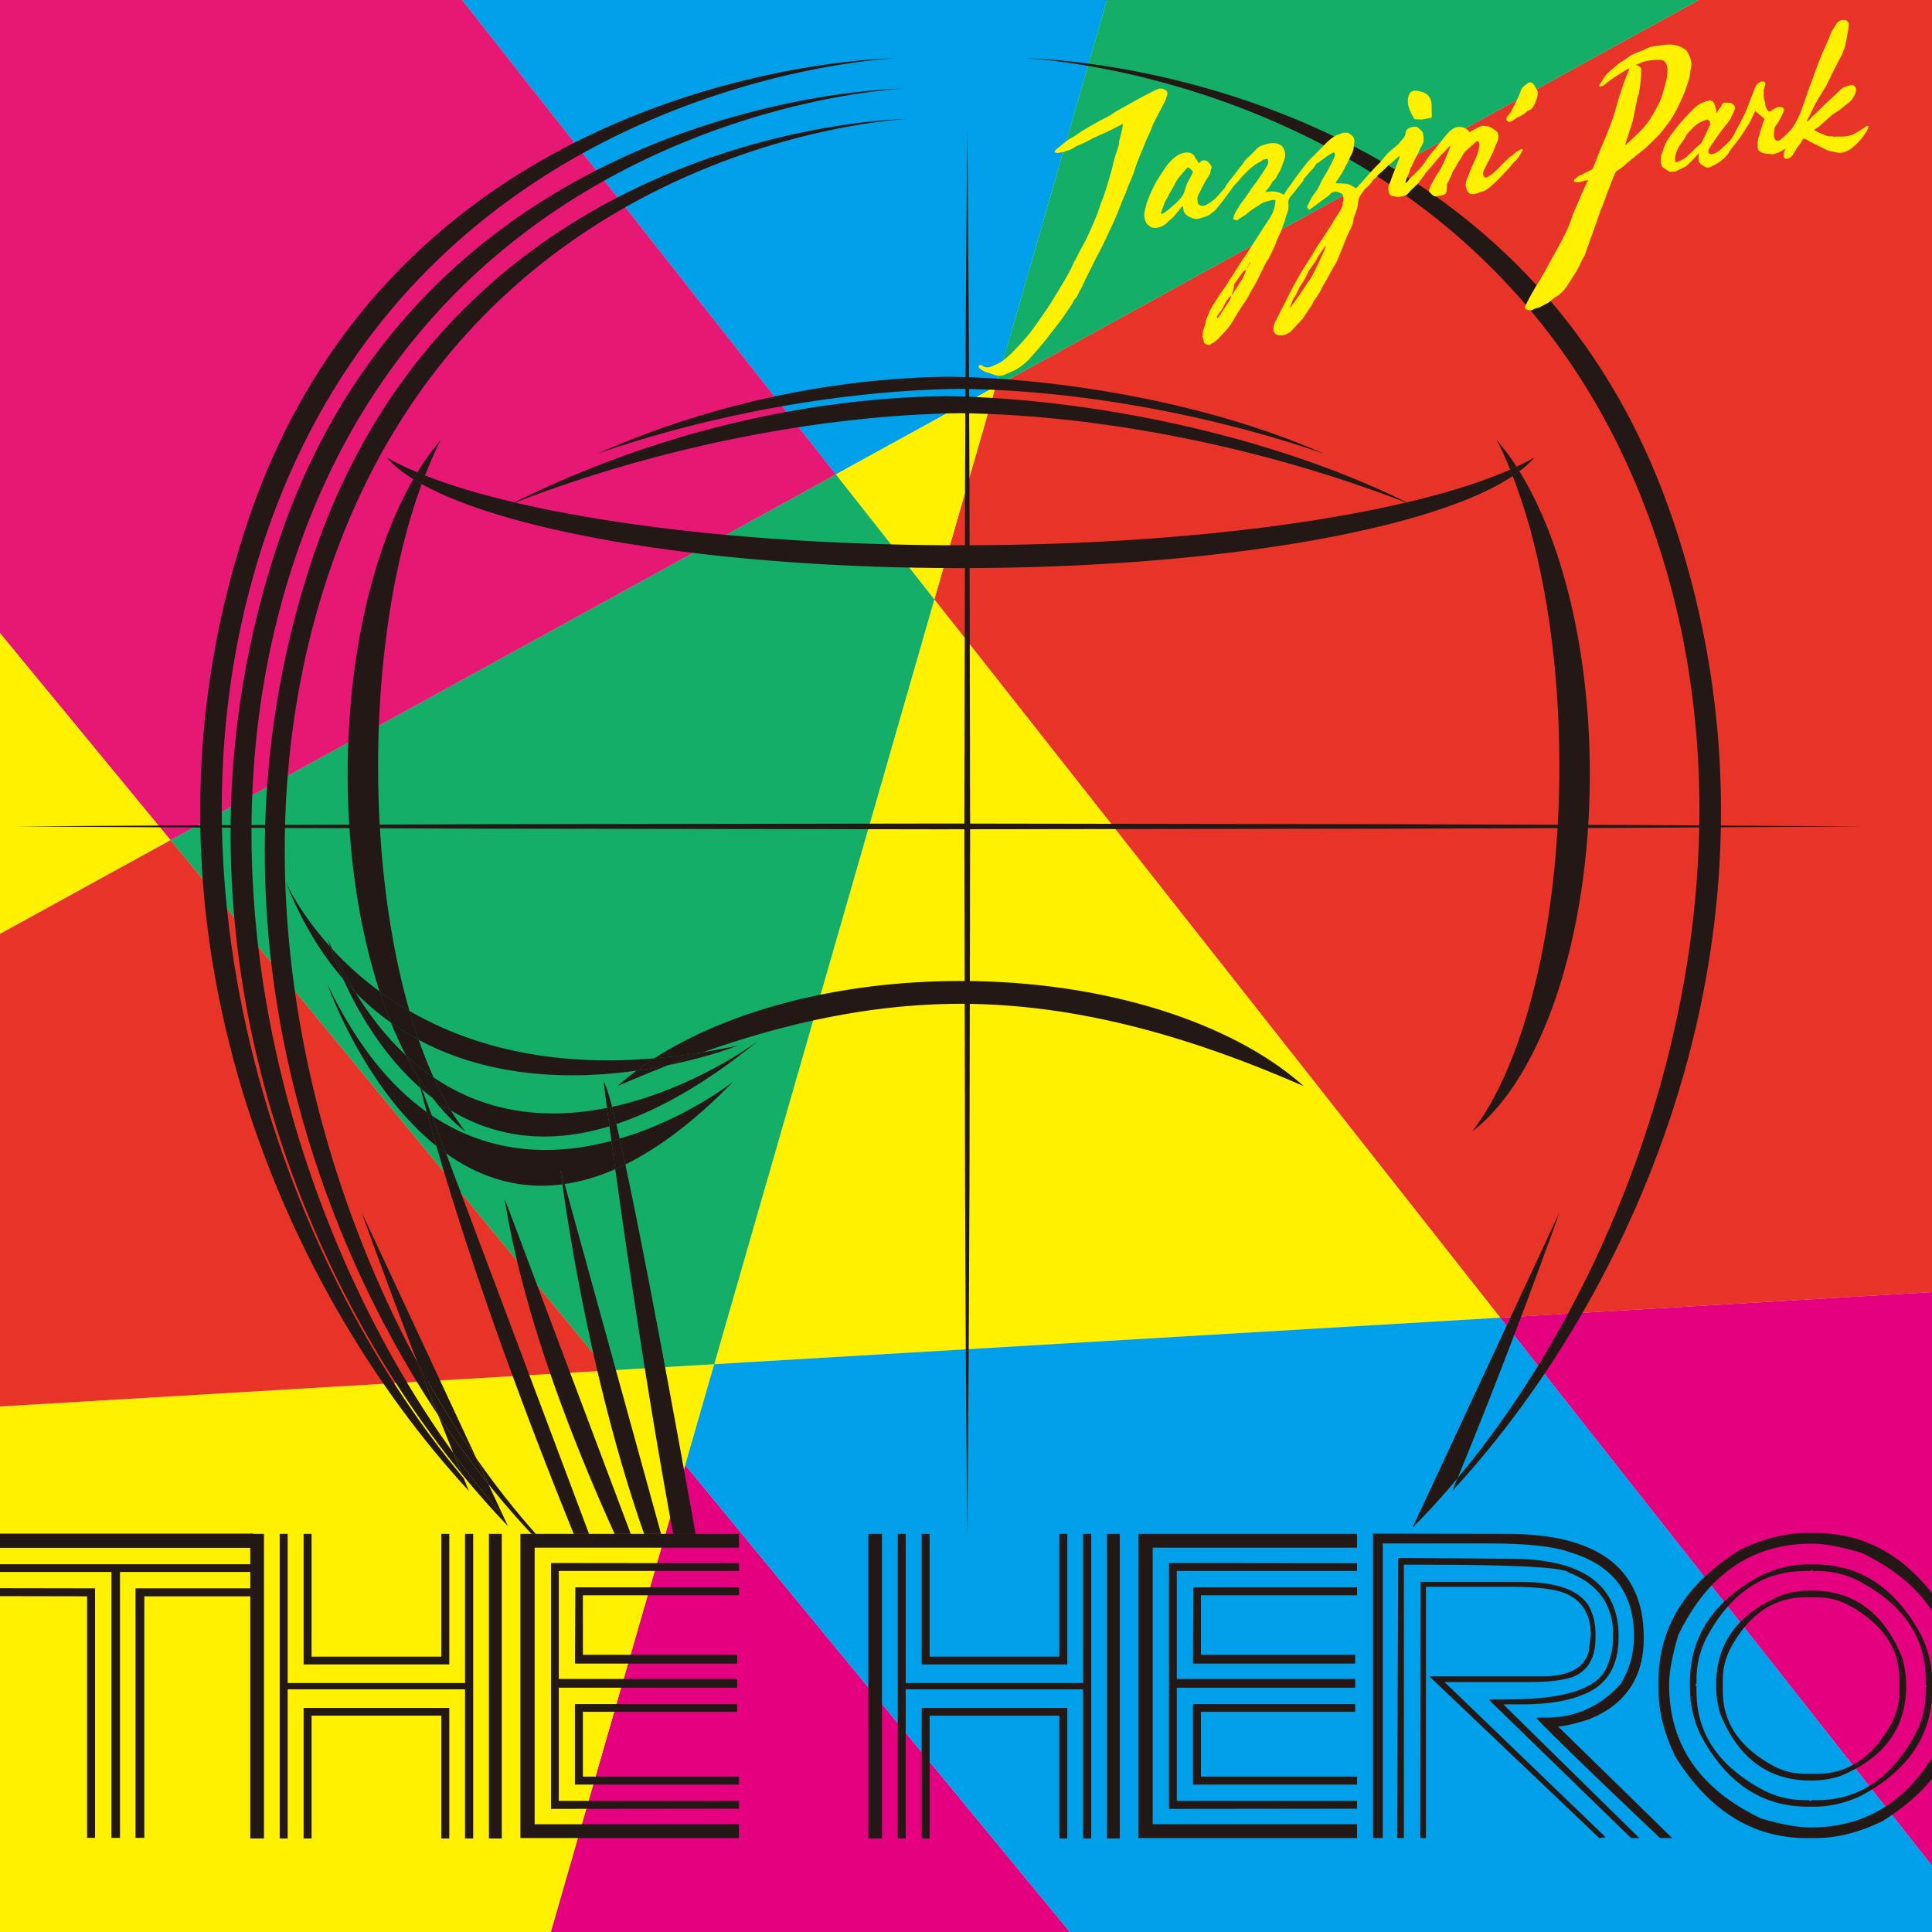 Jazzin'park [THEHERO]